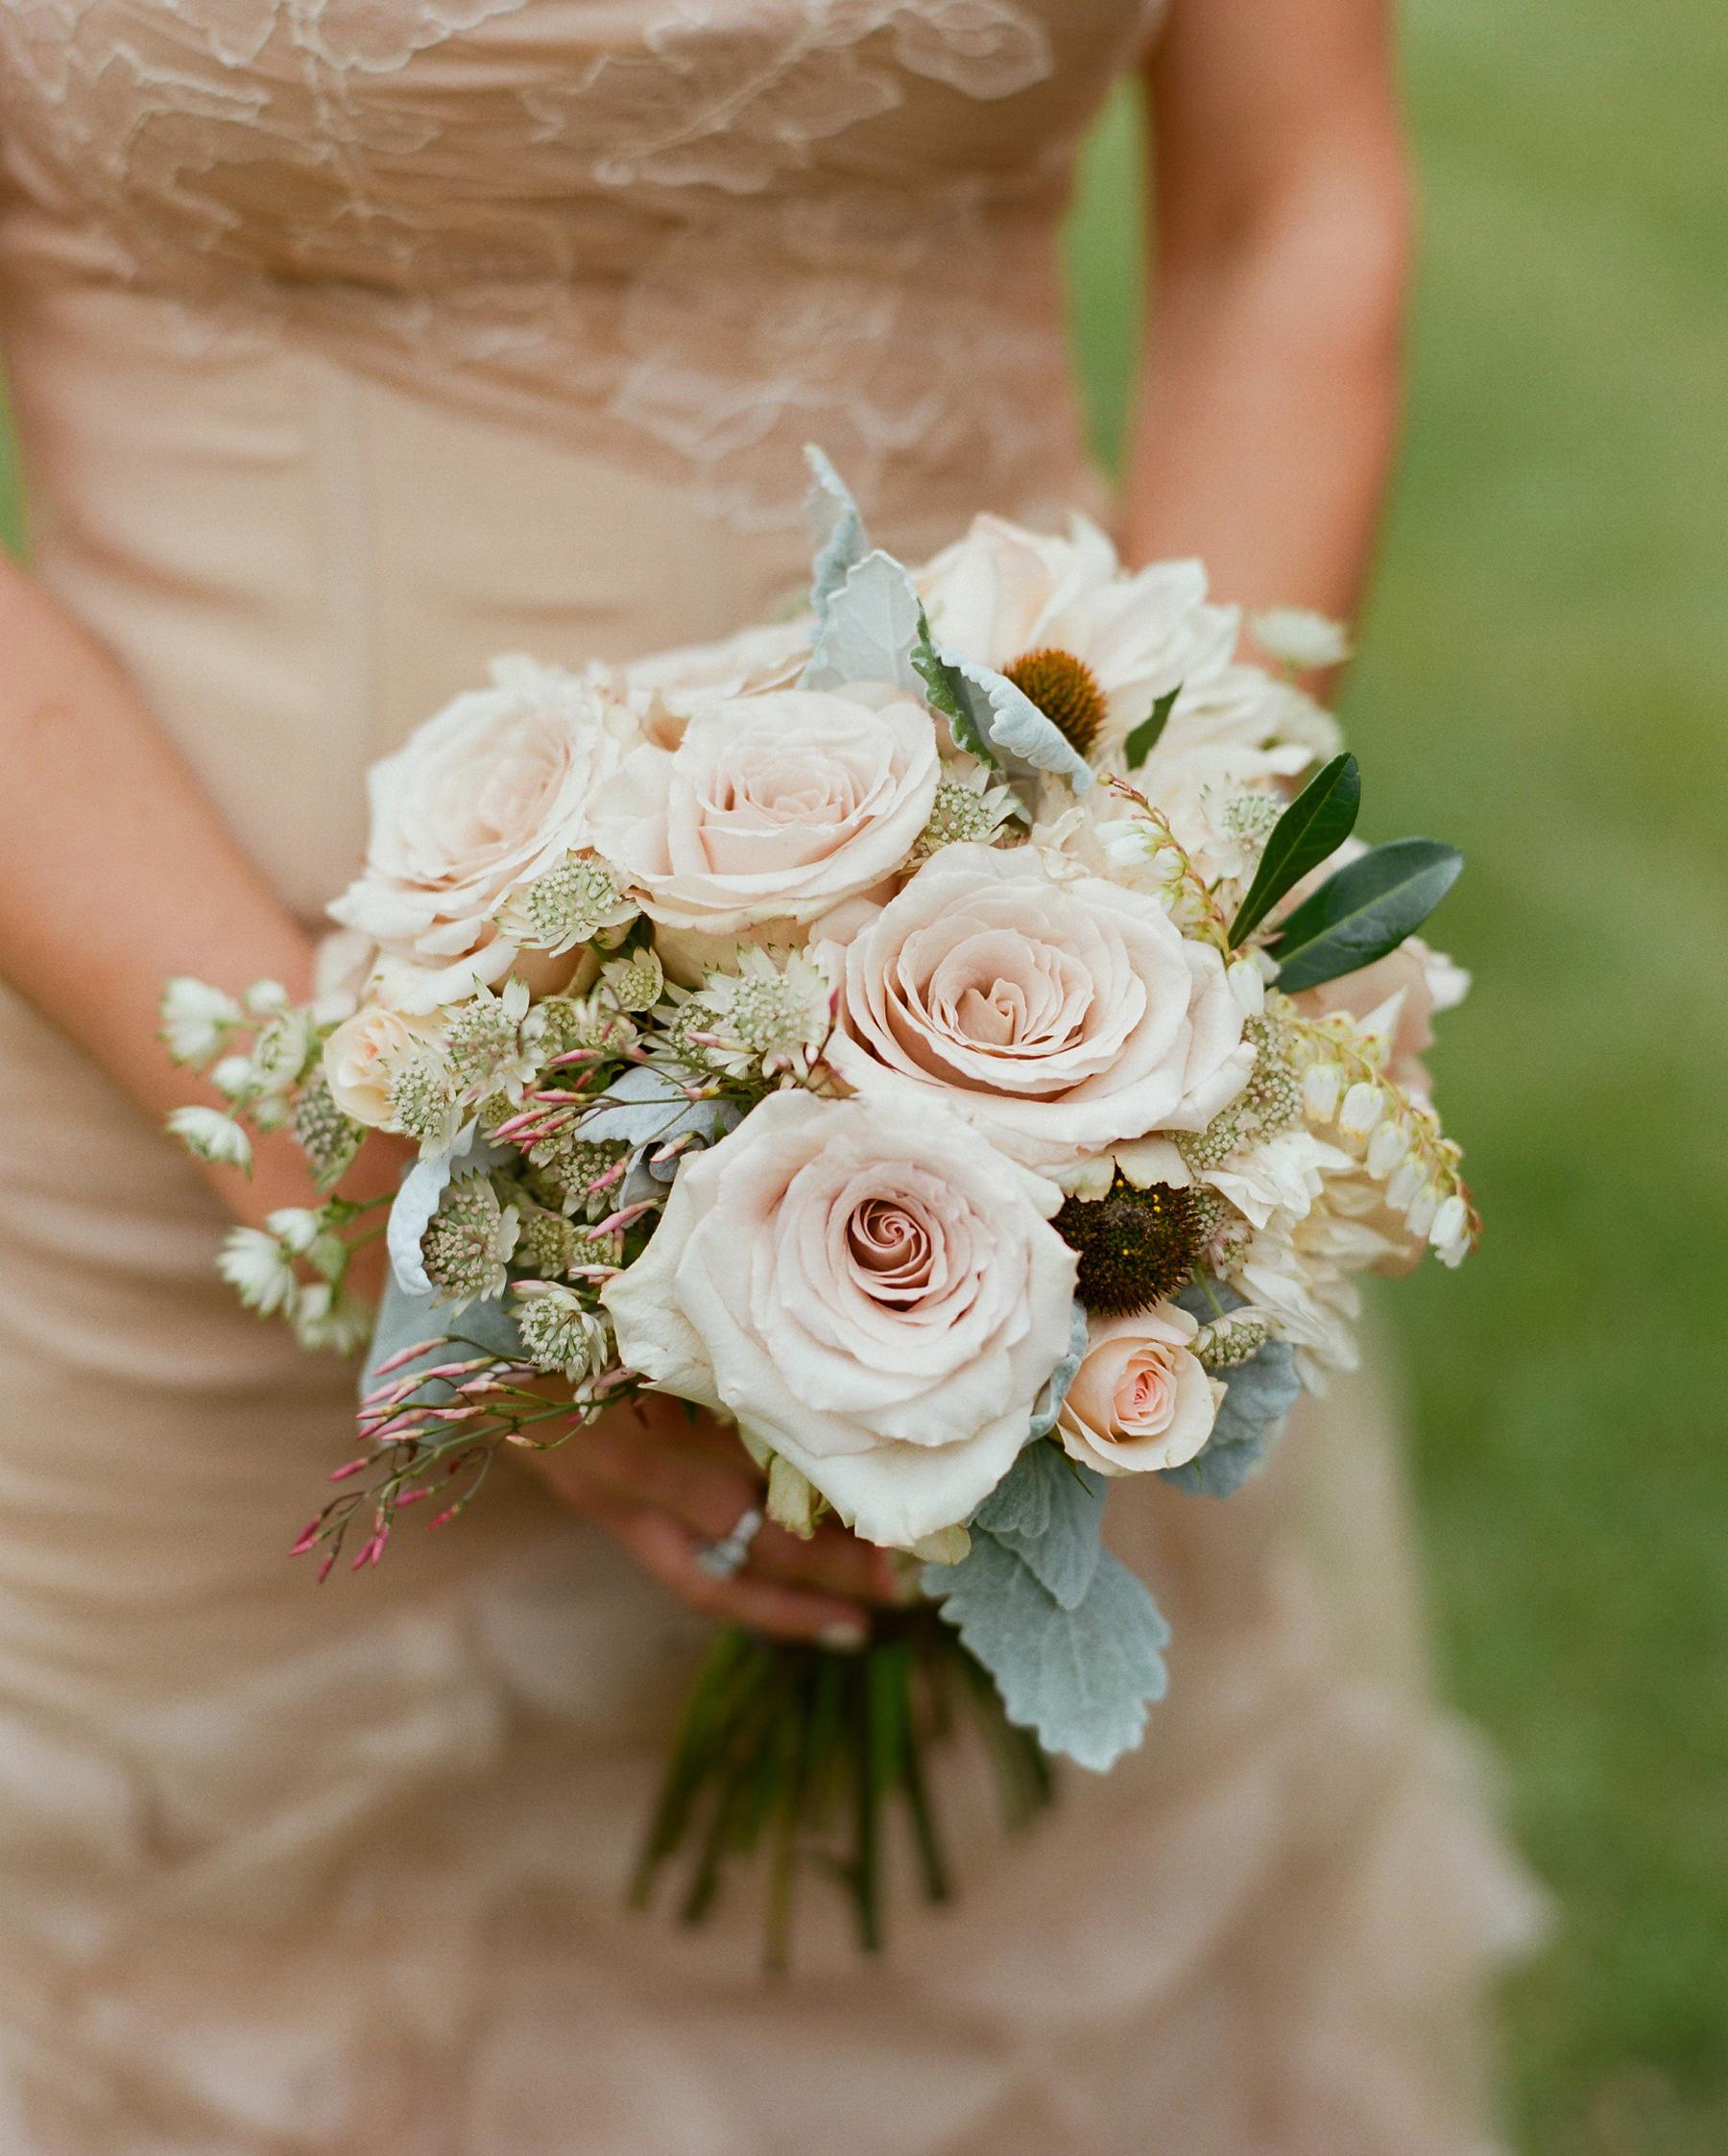 callie-eric-wedding-bouquet-121-s112113-0815.jpg